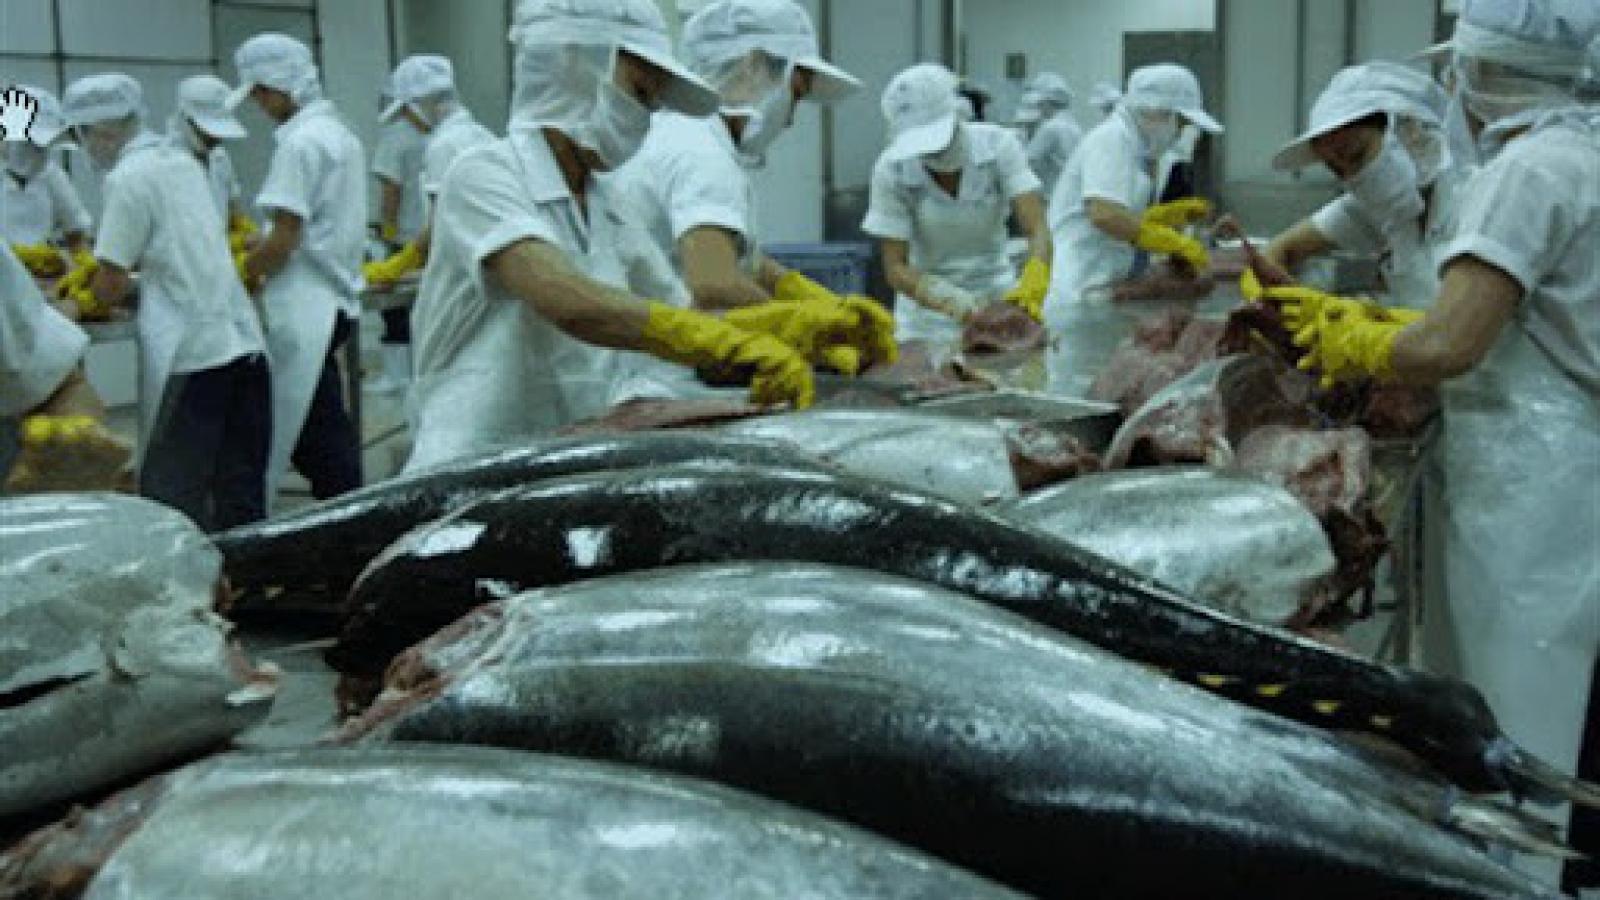 Tuna exports to major markets drop due to COVID-19